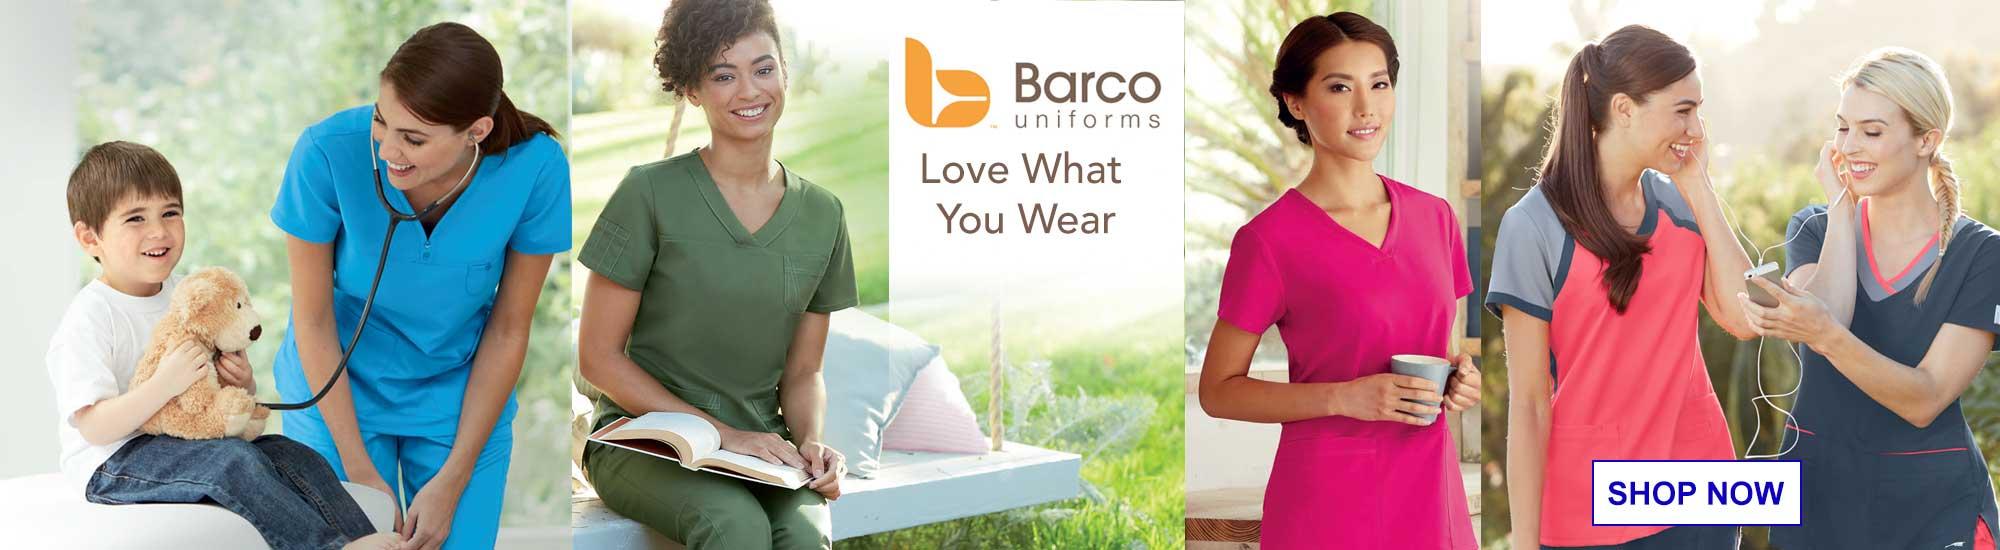 Shop Barco Medical Uniforms